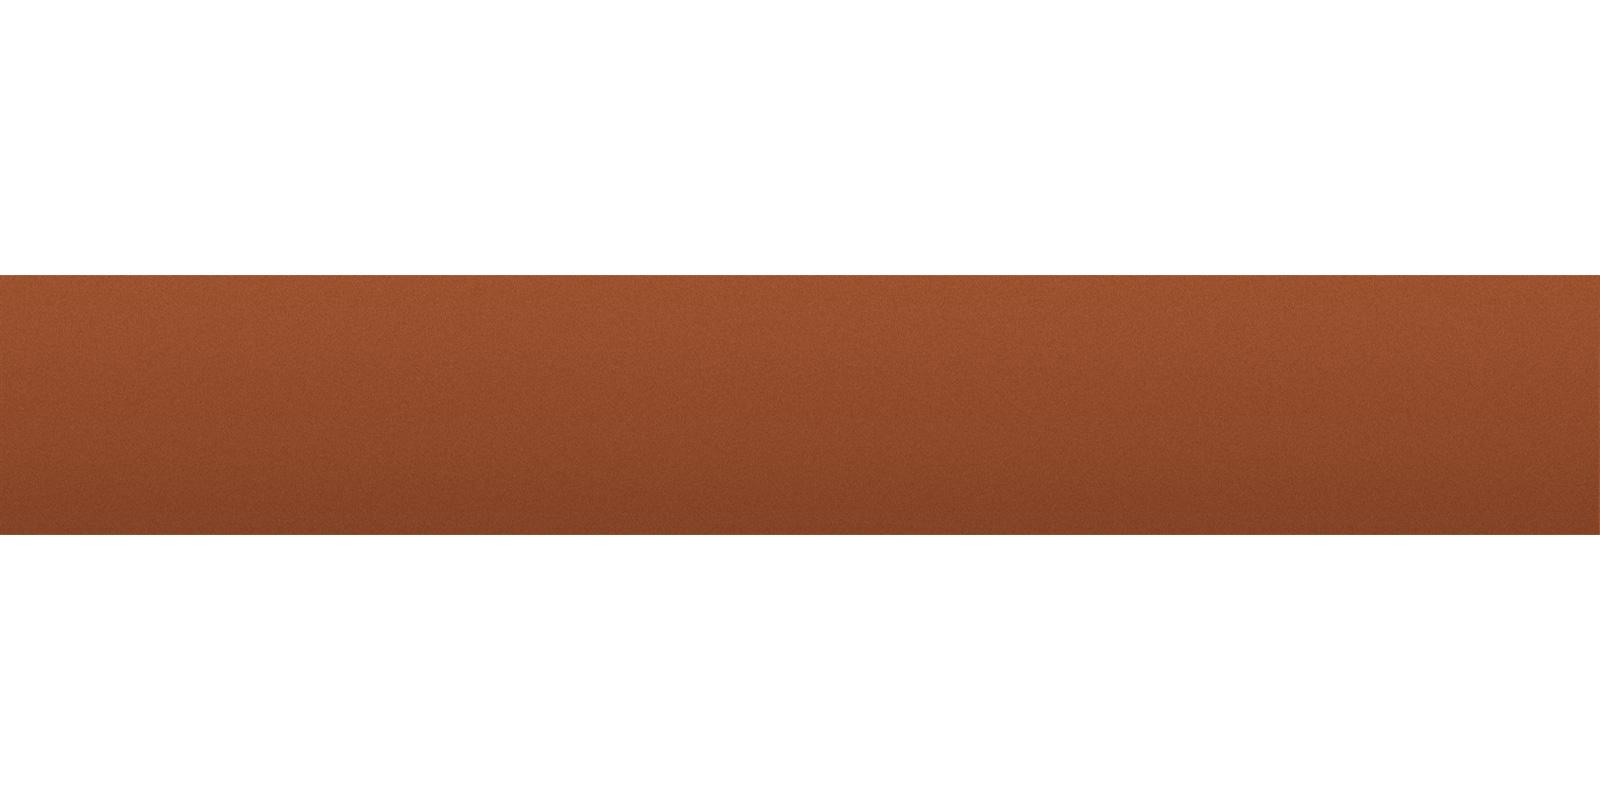 brown banner